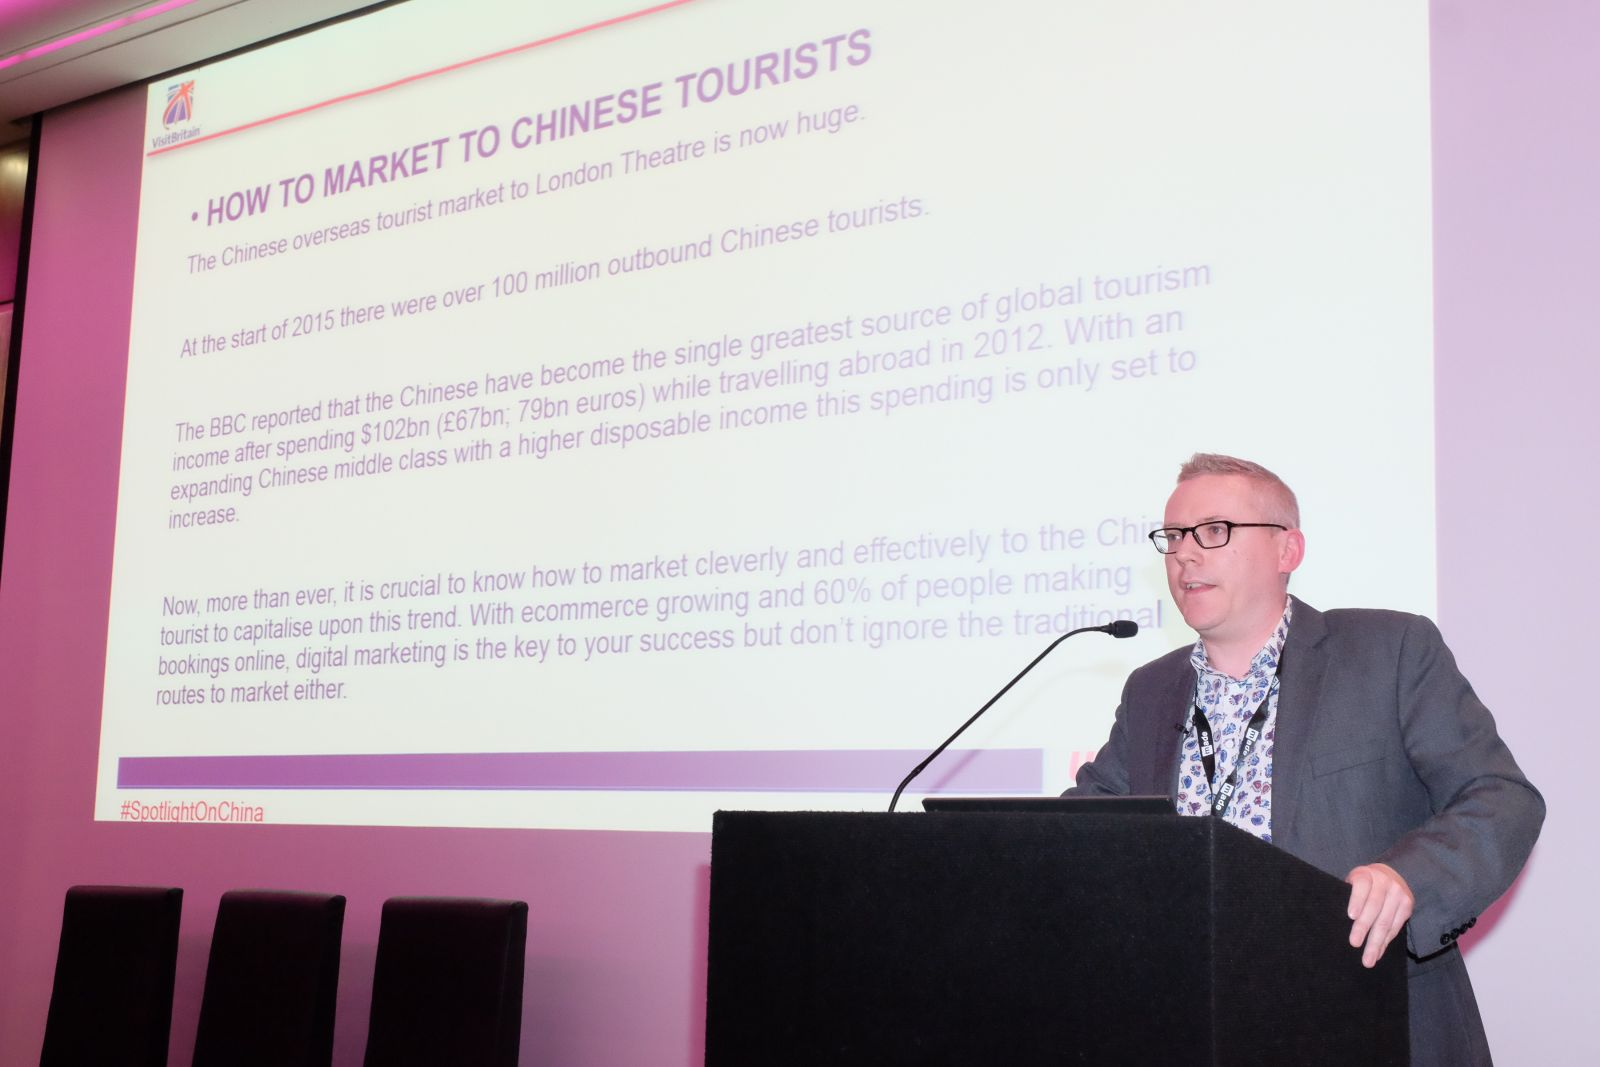 UKinbound: SpotLight on China